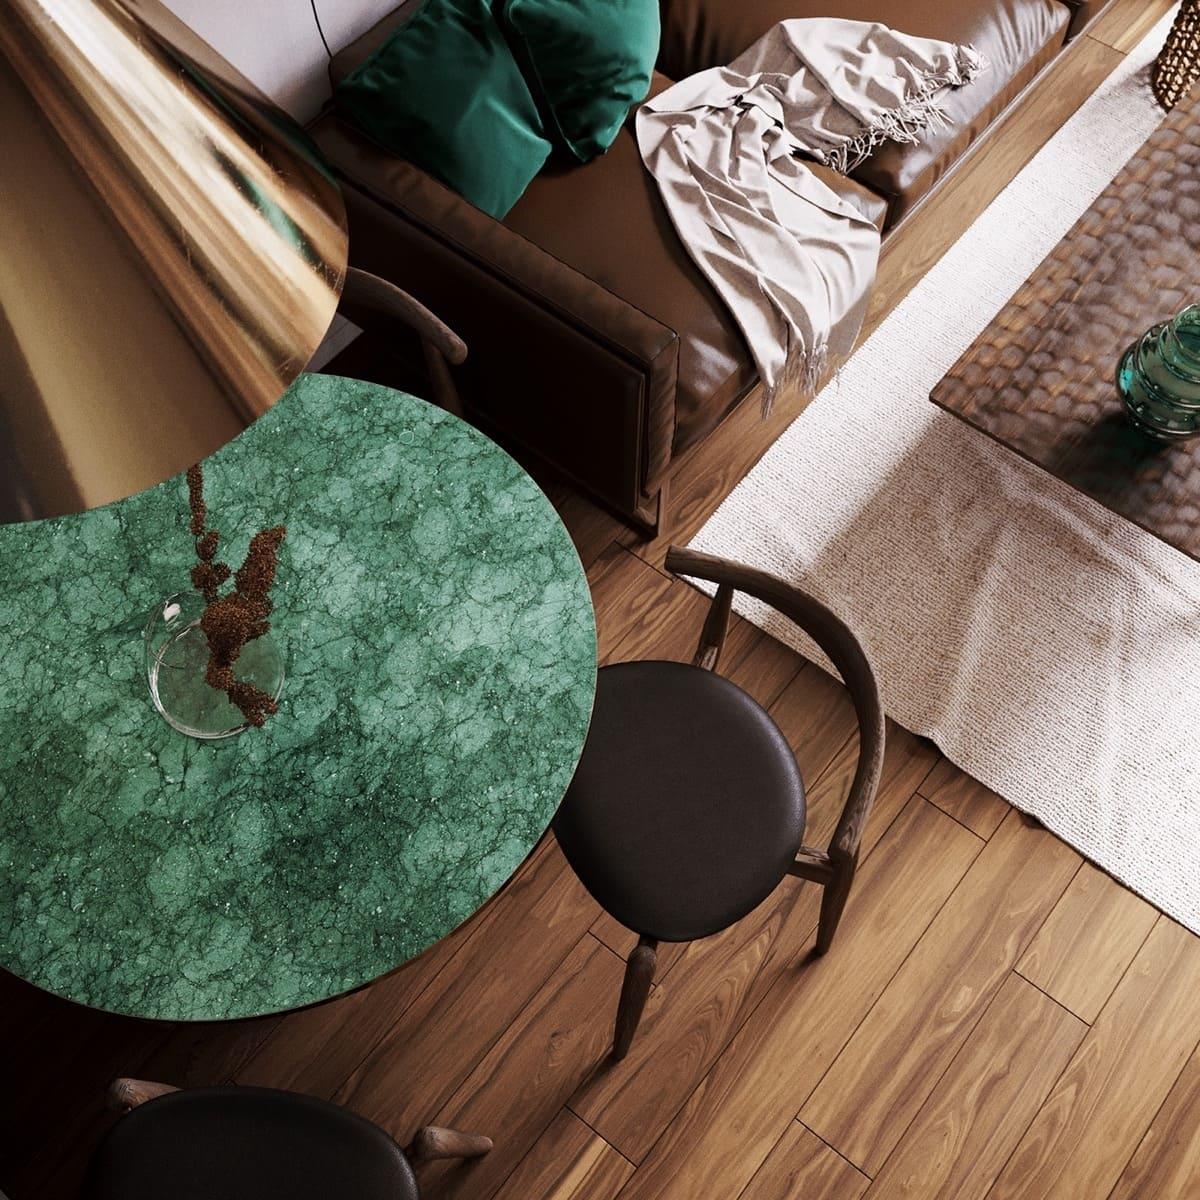 дизайн интерьера модной квартиры фото 65